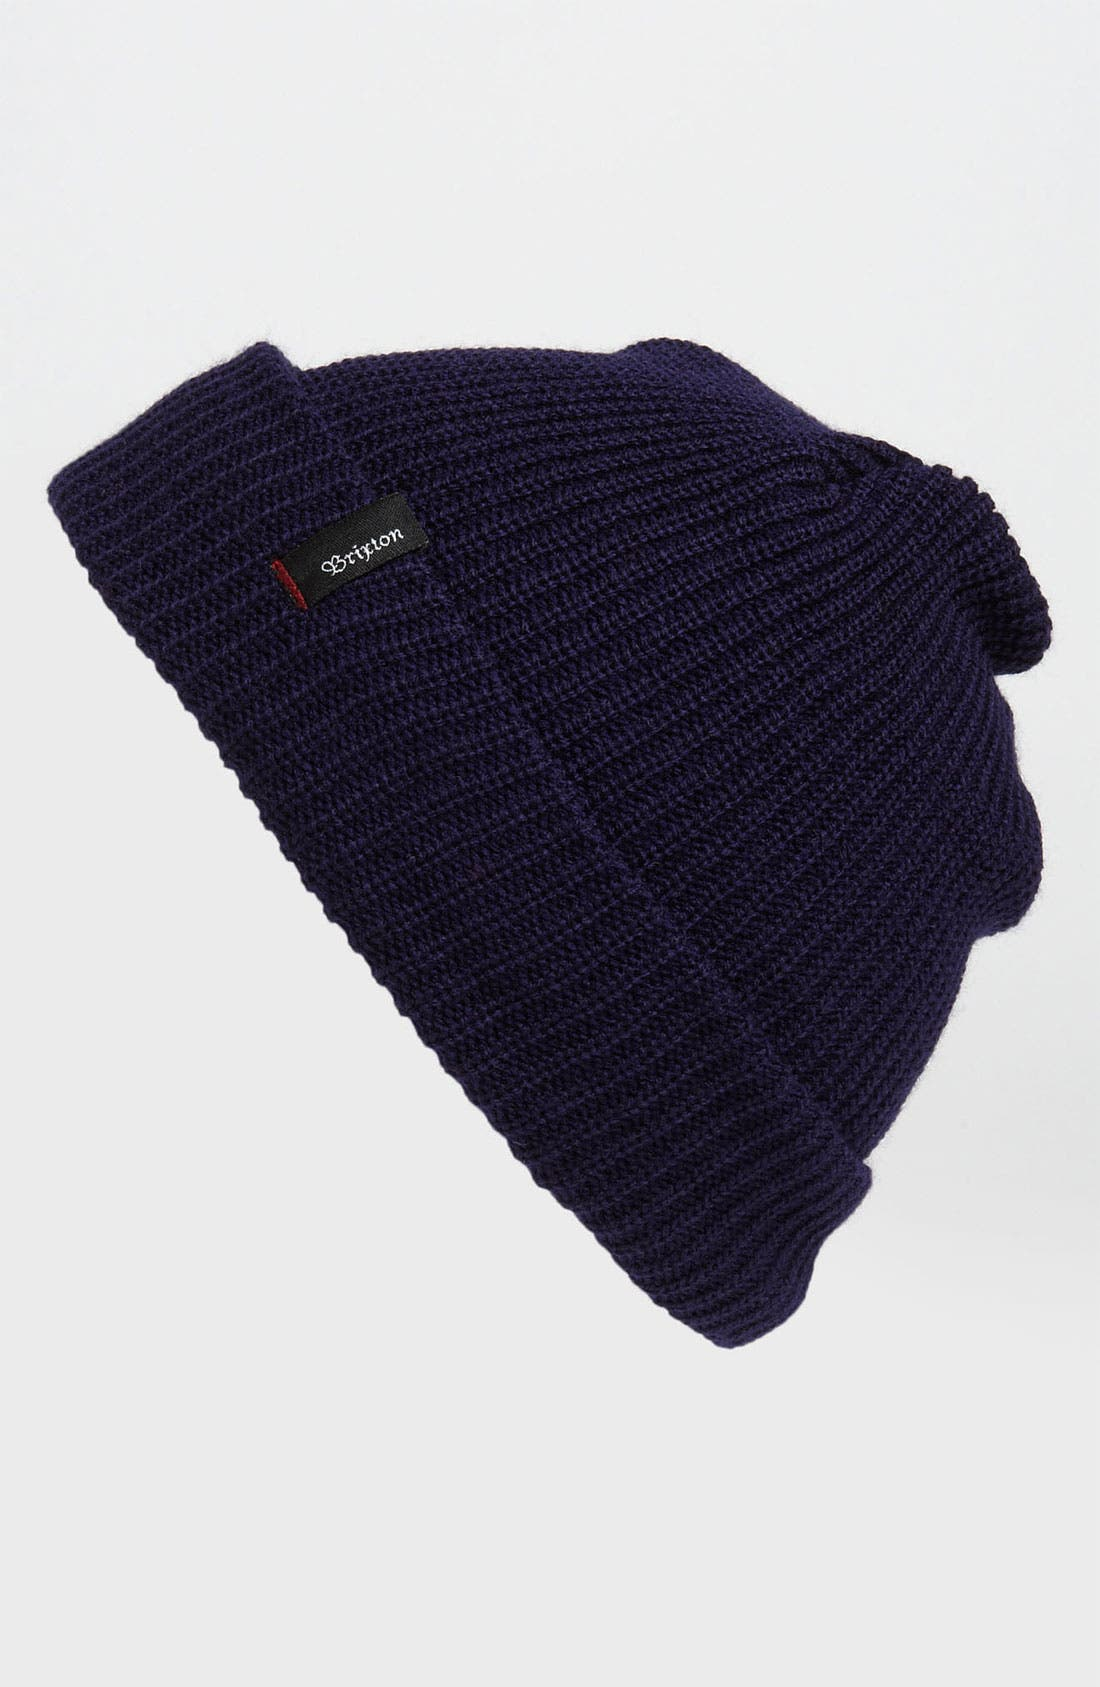 'Heist' Rib Knit Cap,                             Main thumbnail 8, color,